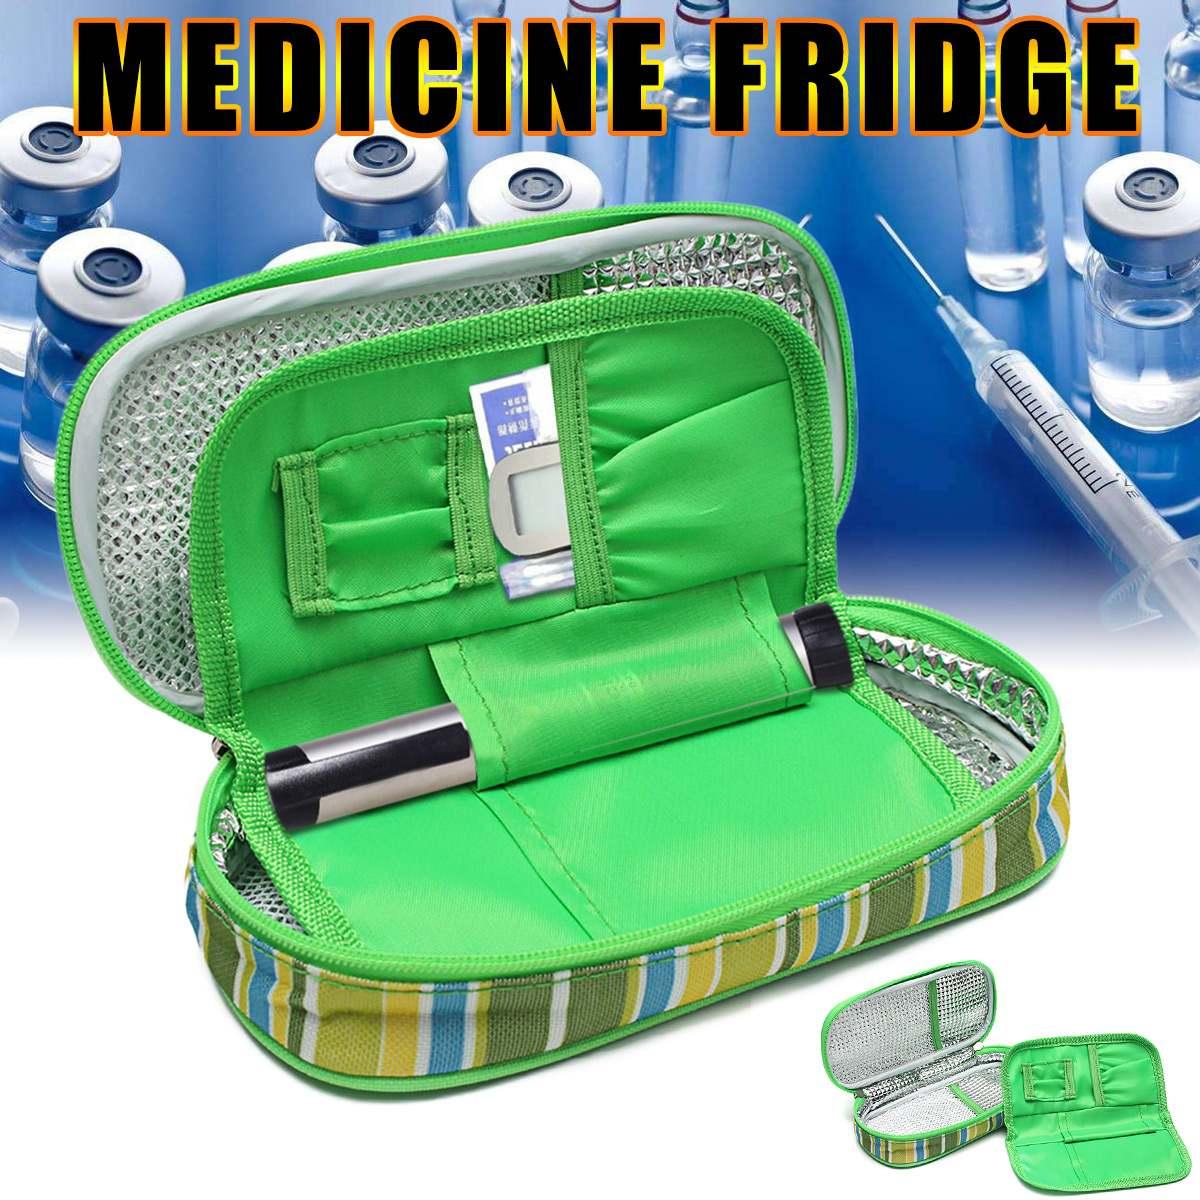 Osmond Portable Medicine Diabetic Insulin Cooling Pouch Cooler Ice Pack Bag Travel CaseOsmond Portable Medicine Diabetic Insulin Cooling Pouch Cooler Ice Pack Bag Travel Case